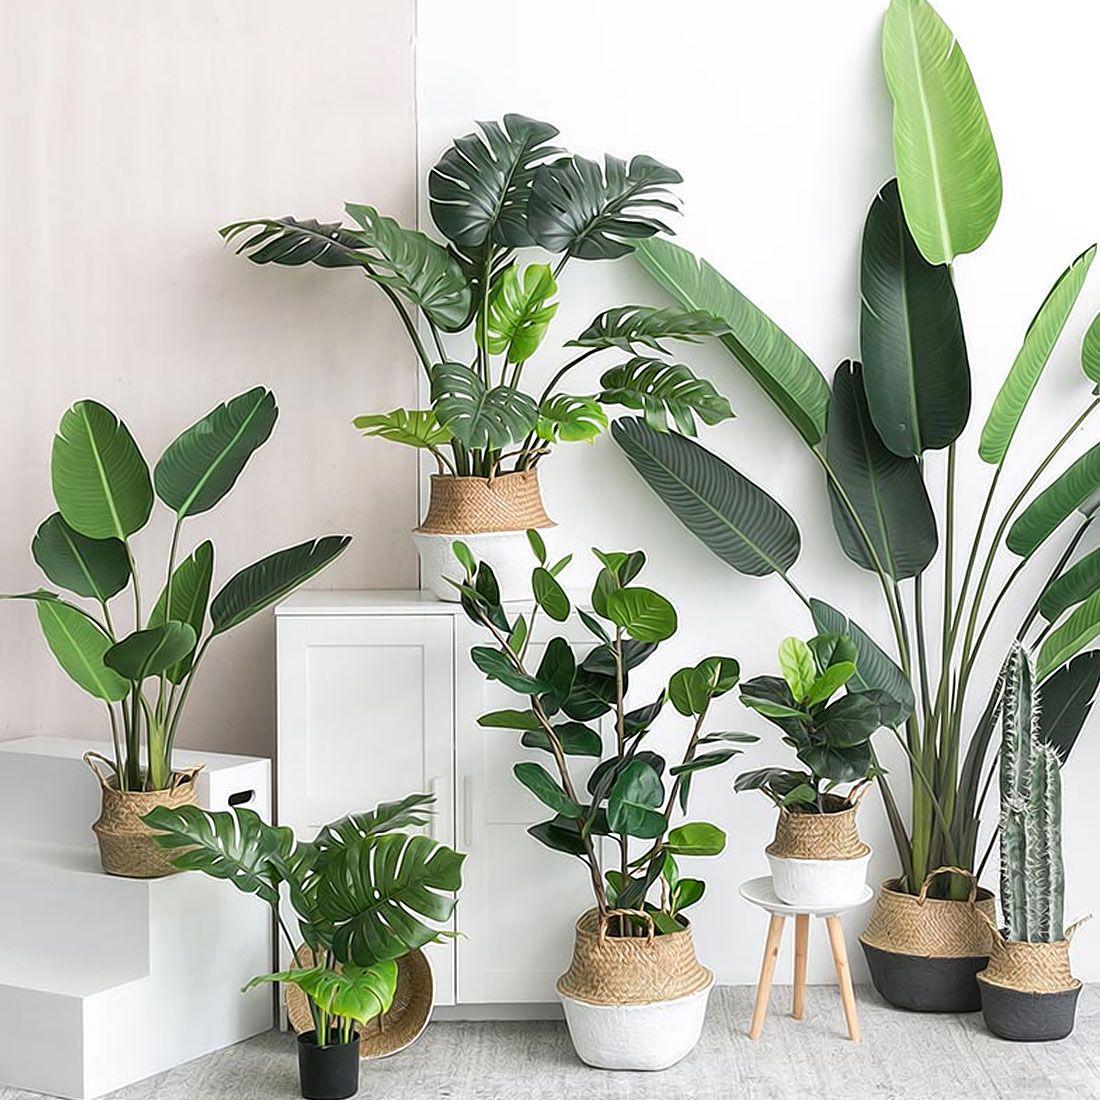 Artificial Plants Green Turtle Leaves Garden Home Decor 1 Bouquet